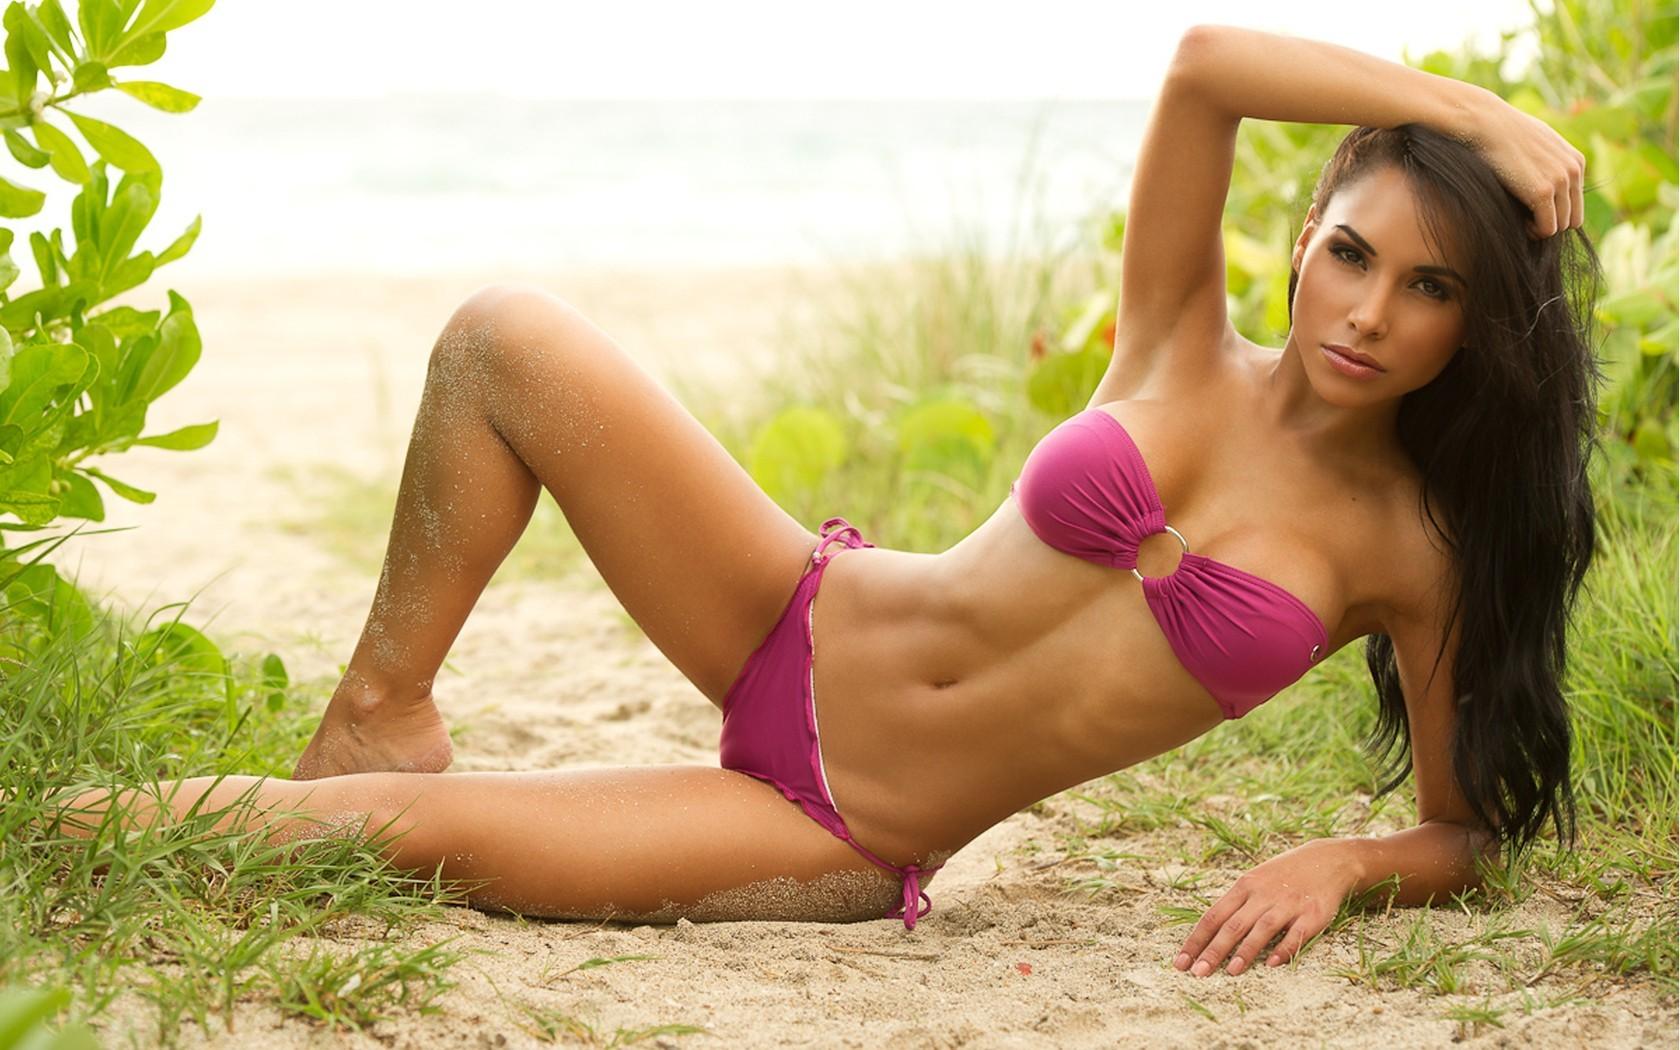 Print on can vas hot brunette girl sexy bikini butt